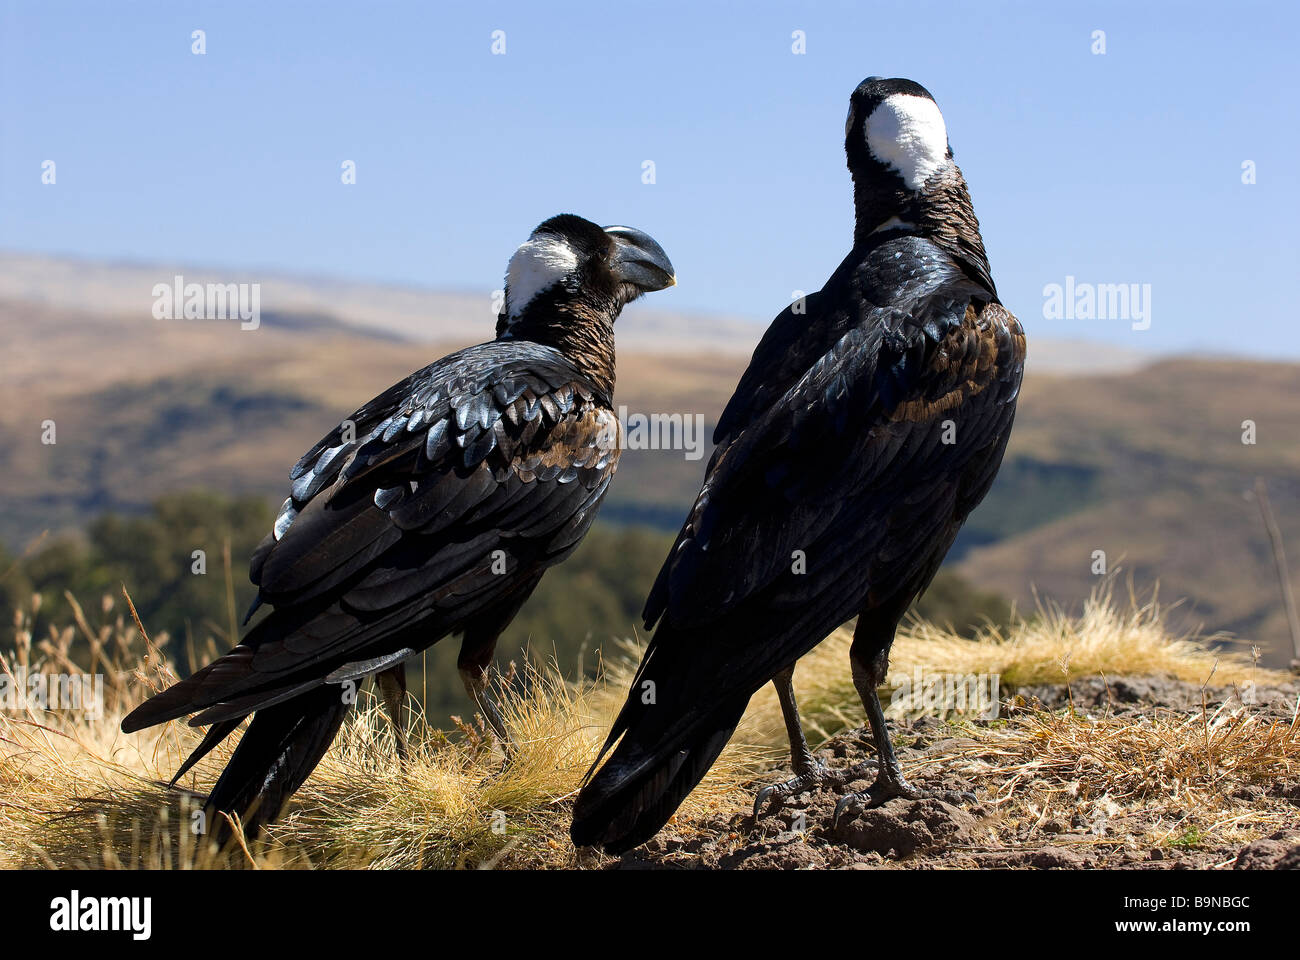 Ethiopia, Simien Mountains National Park, classified as World Heritage by UNESCO, corbivau crows (Corvus crassirostris) - Stock Image